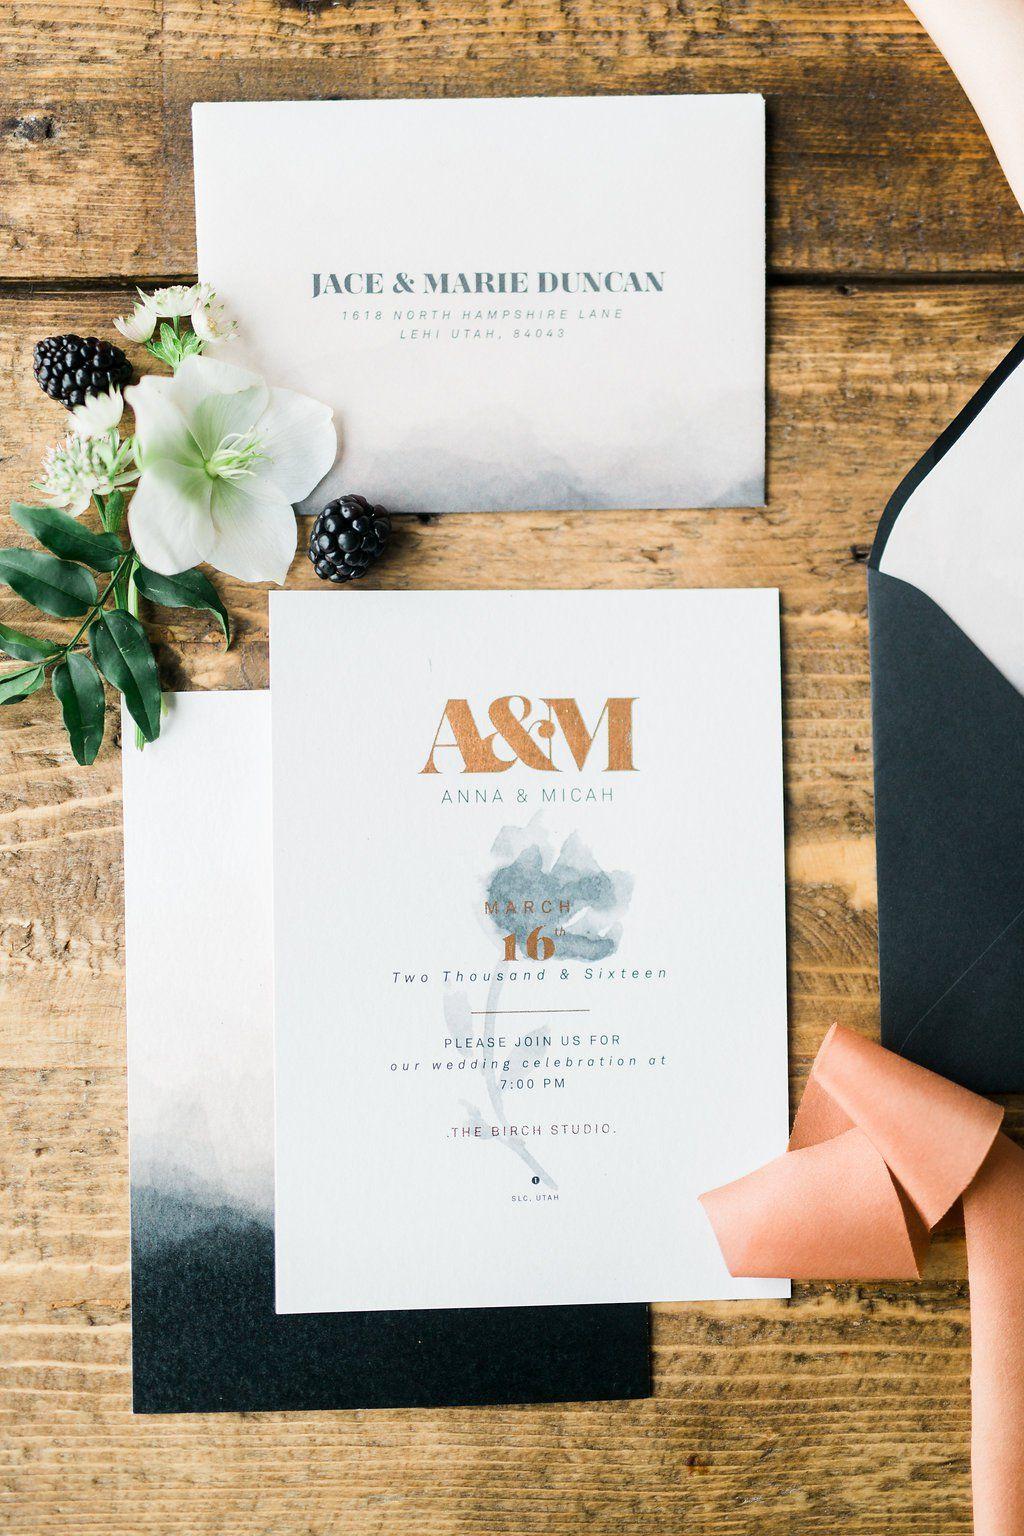 Black & Blush - West End Girl Studio   Wedding Invitation Envelopes ...